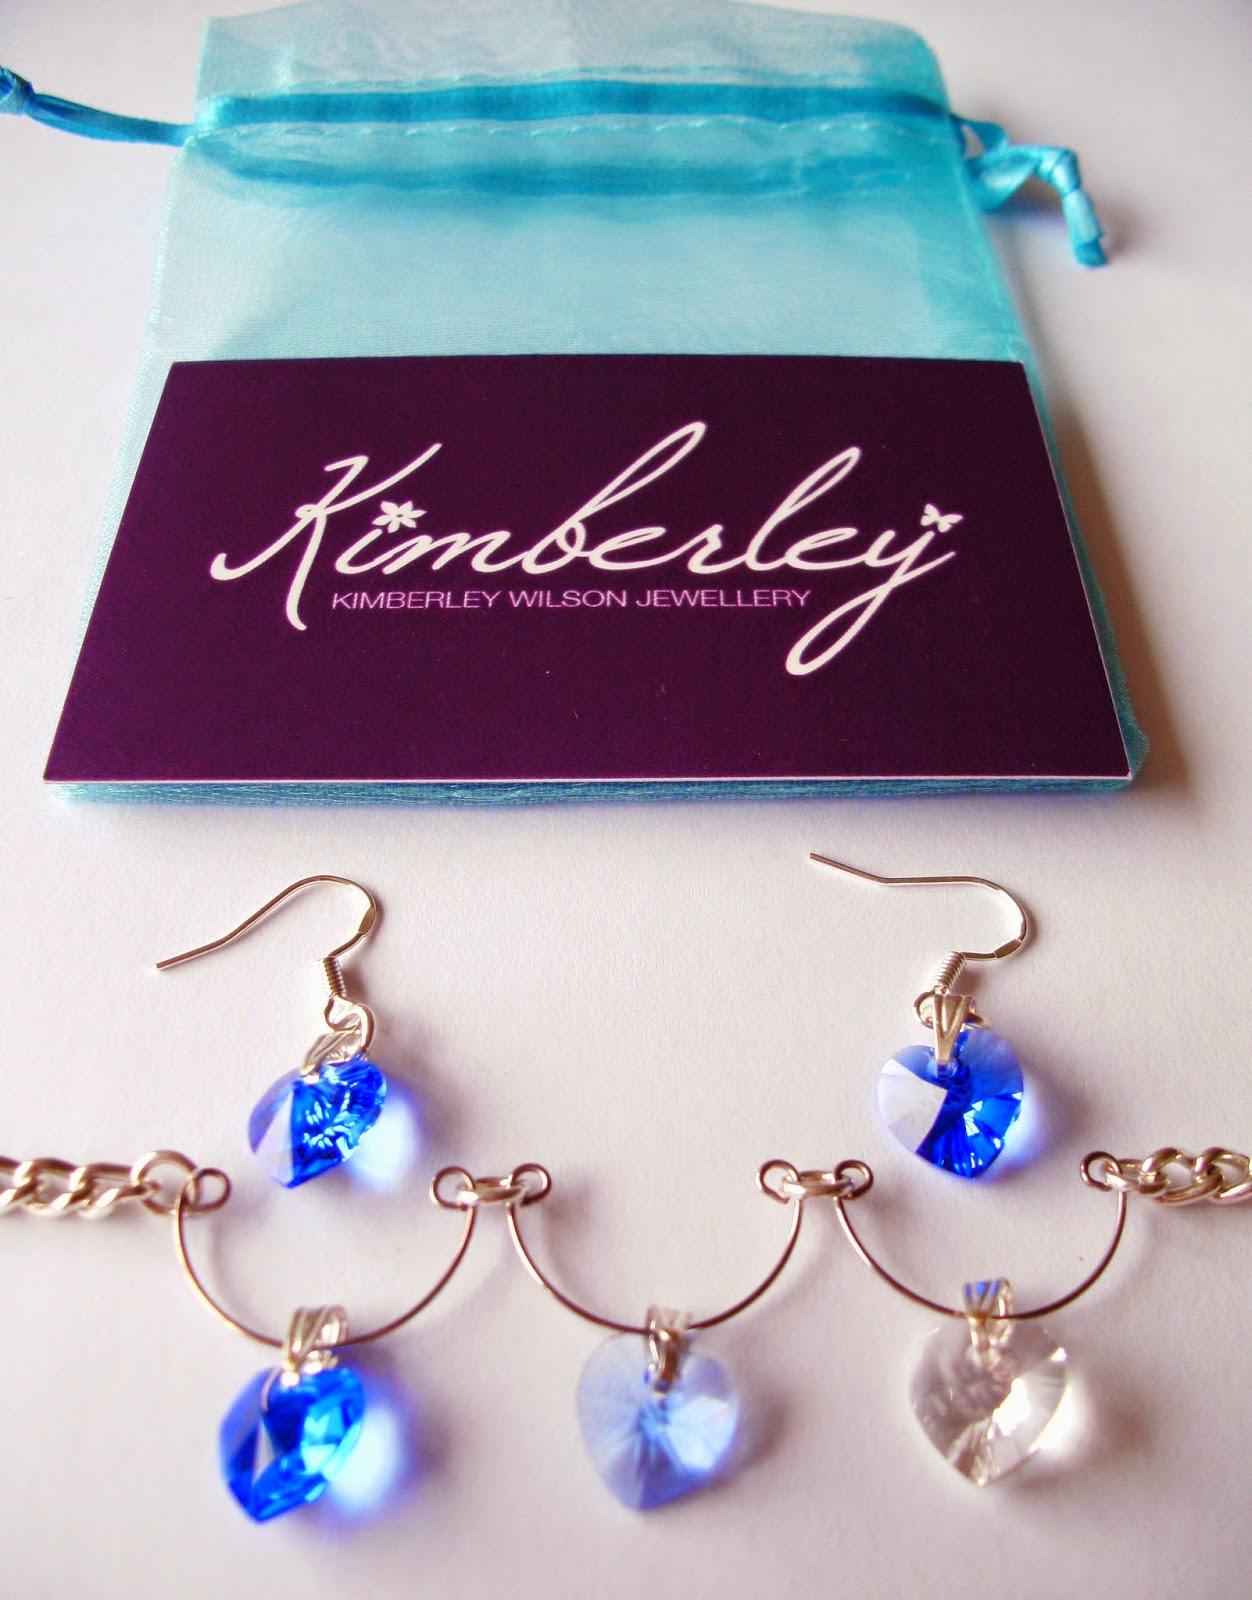 Kimberley Wilson Handmade Jewellery Etsy Shop Kimberleys Jewels